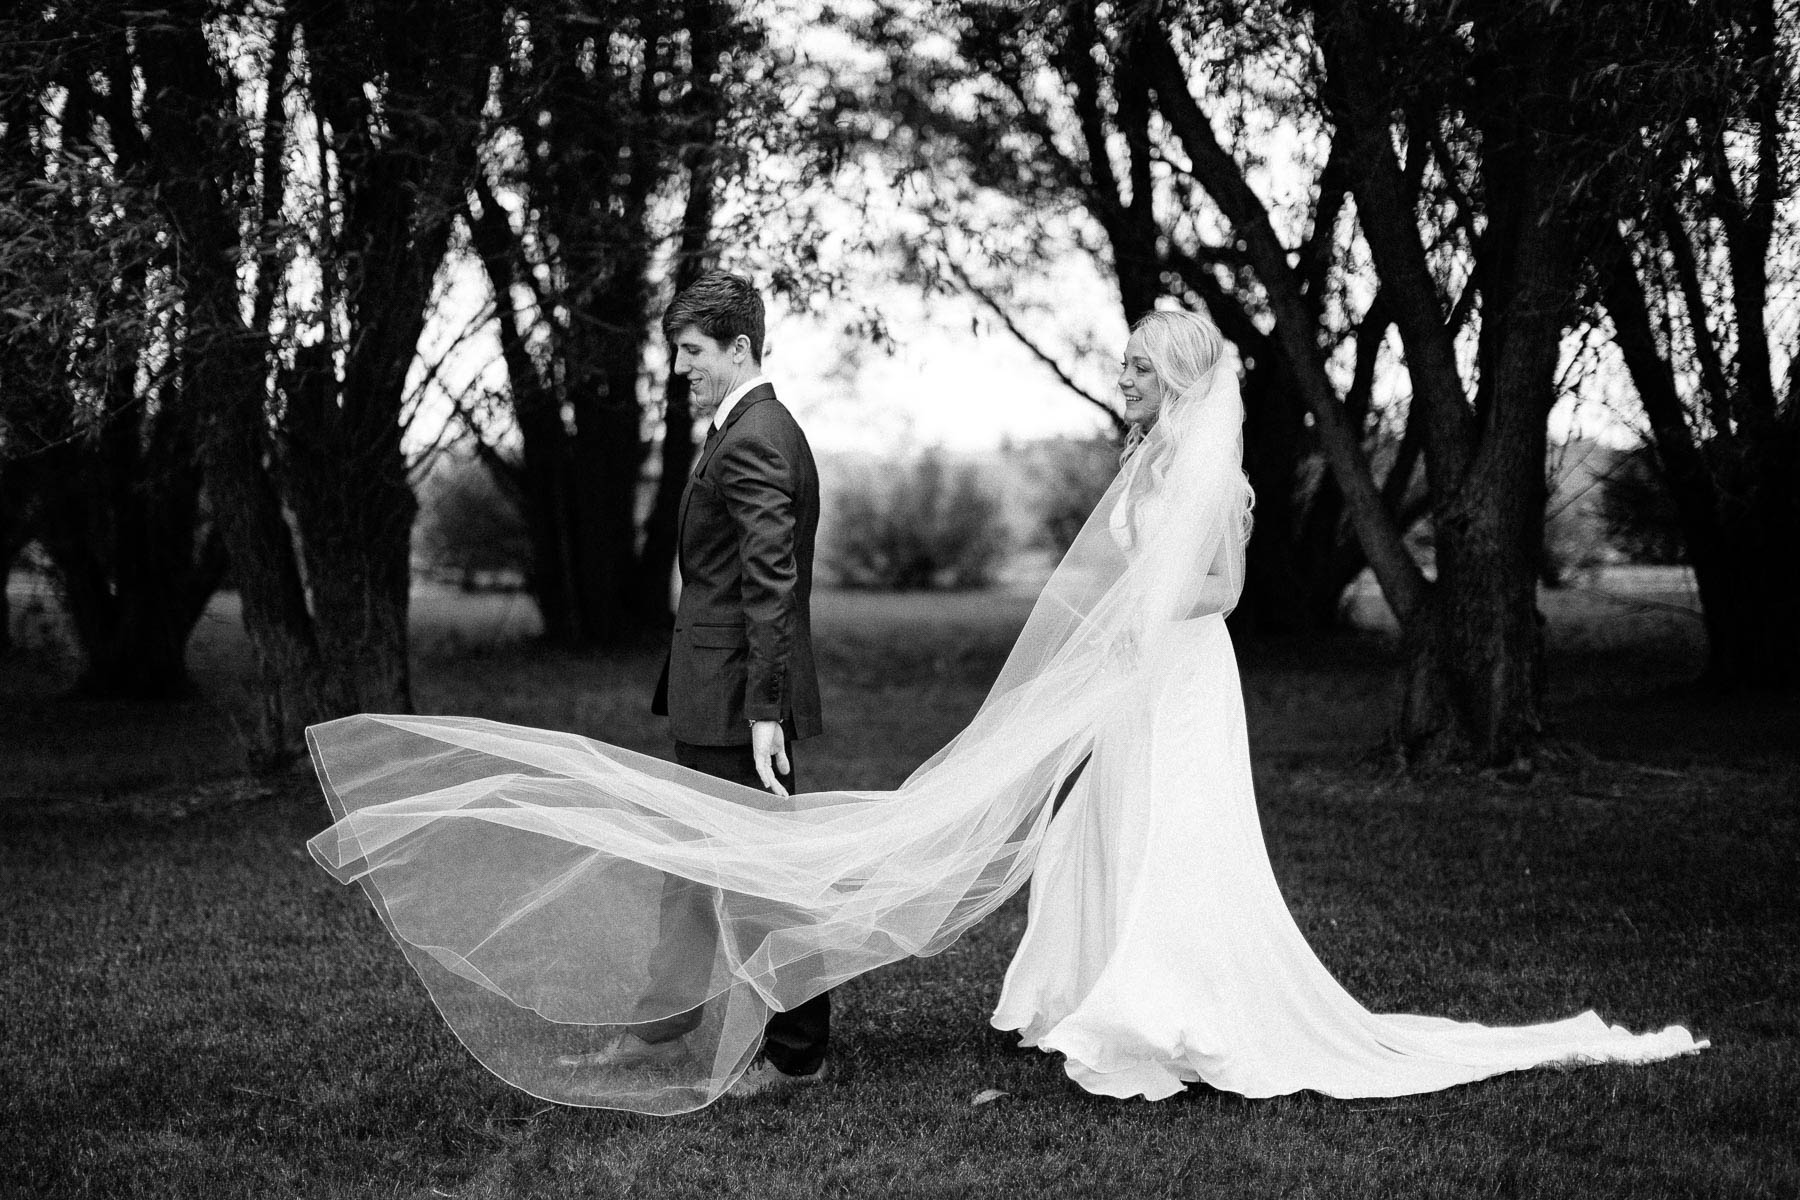 Intimate_Farmhouse_SD_Wedding_Bridgette_Philip_022.jpg